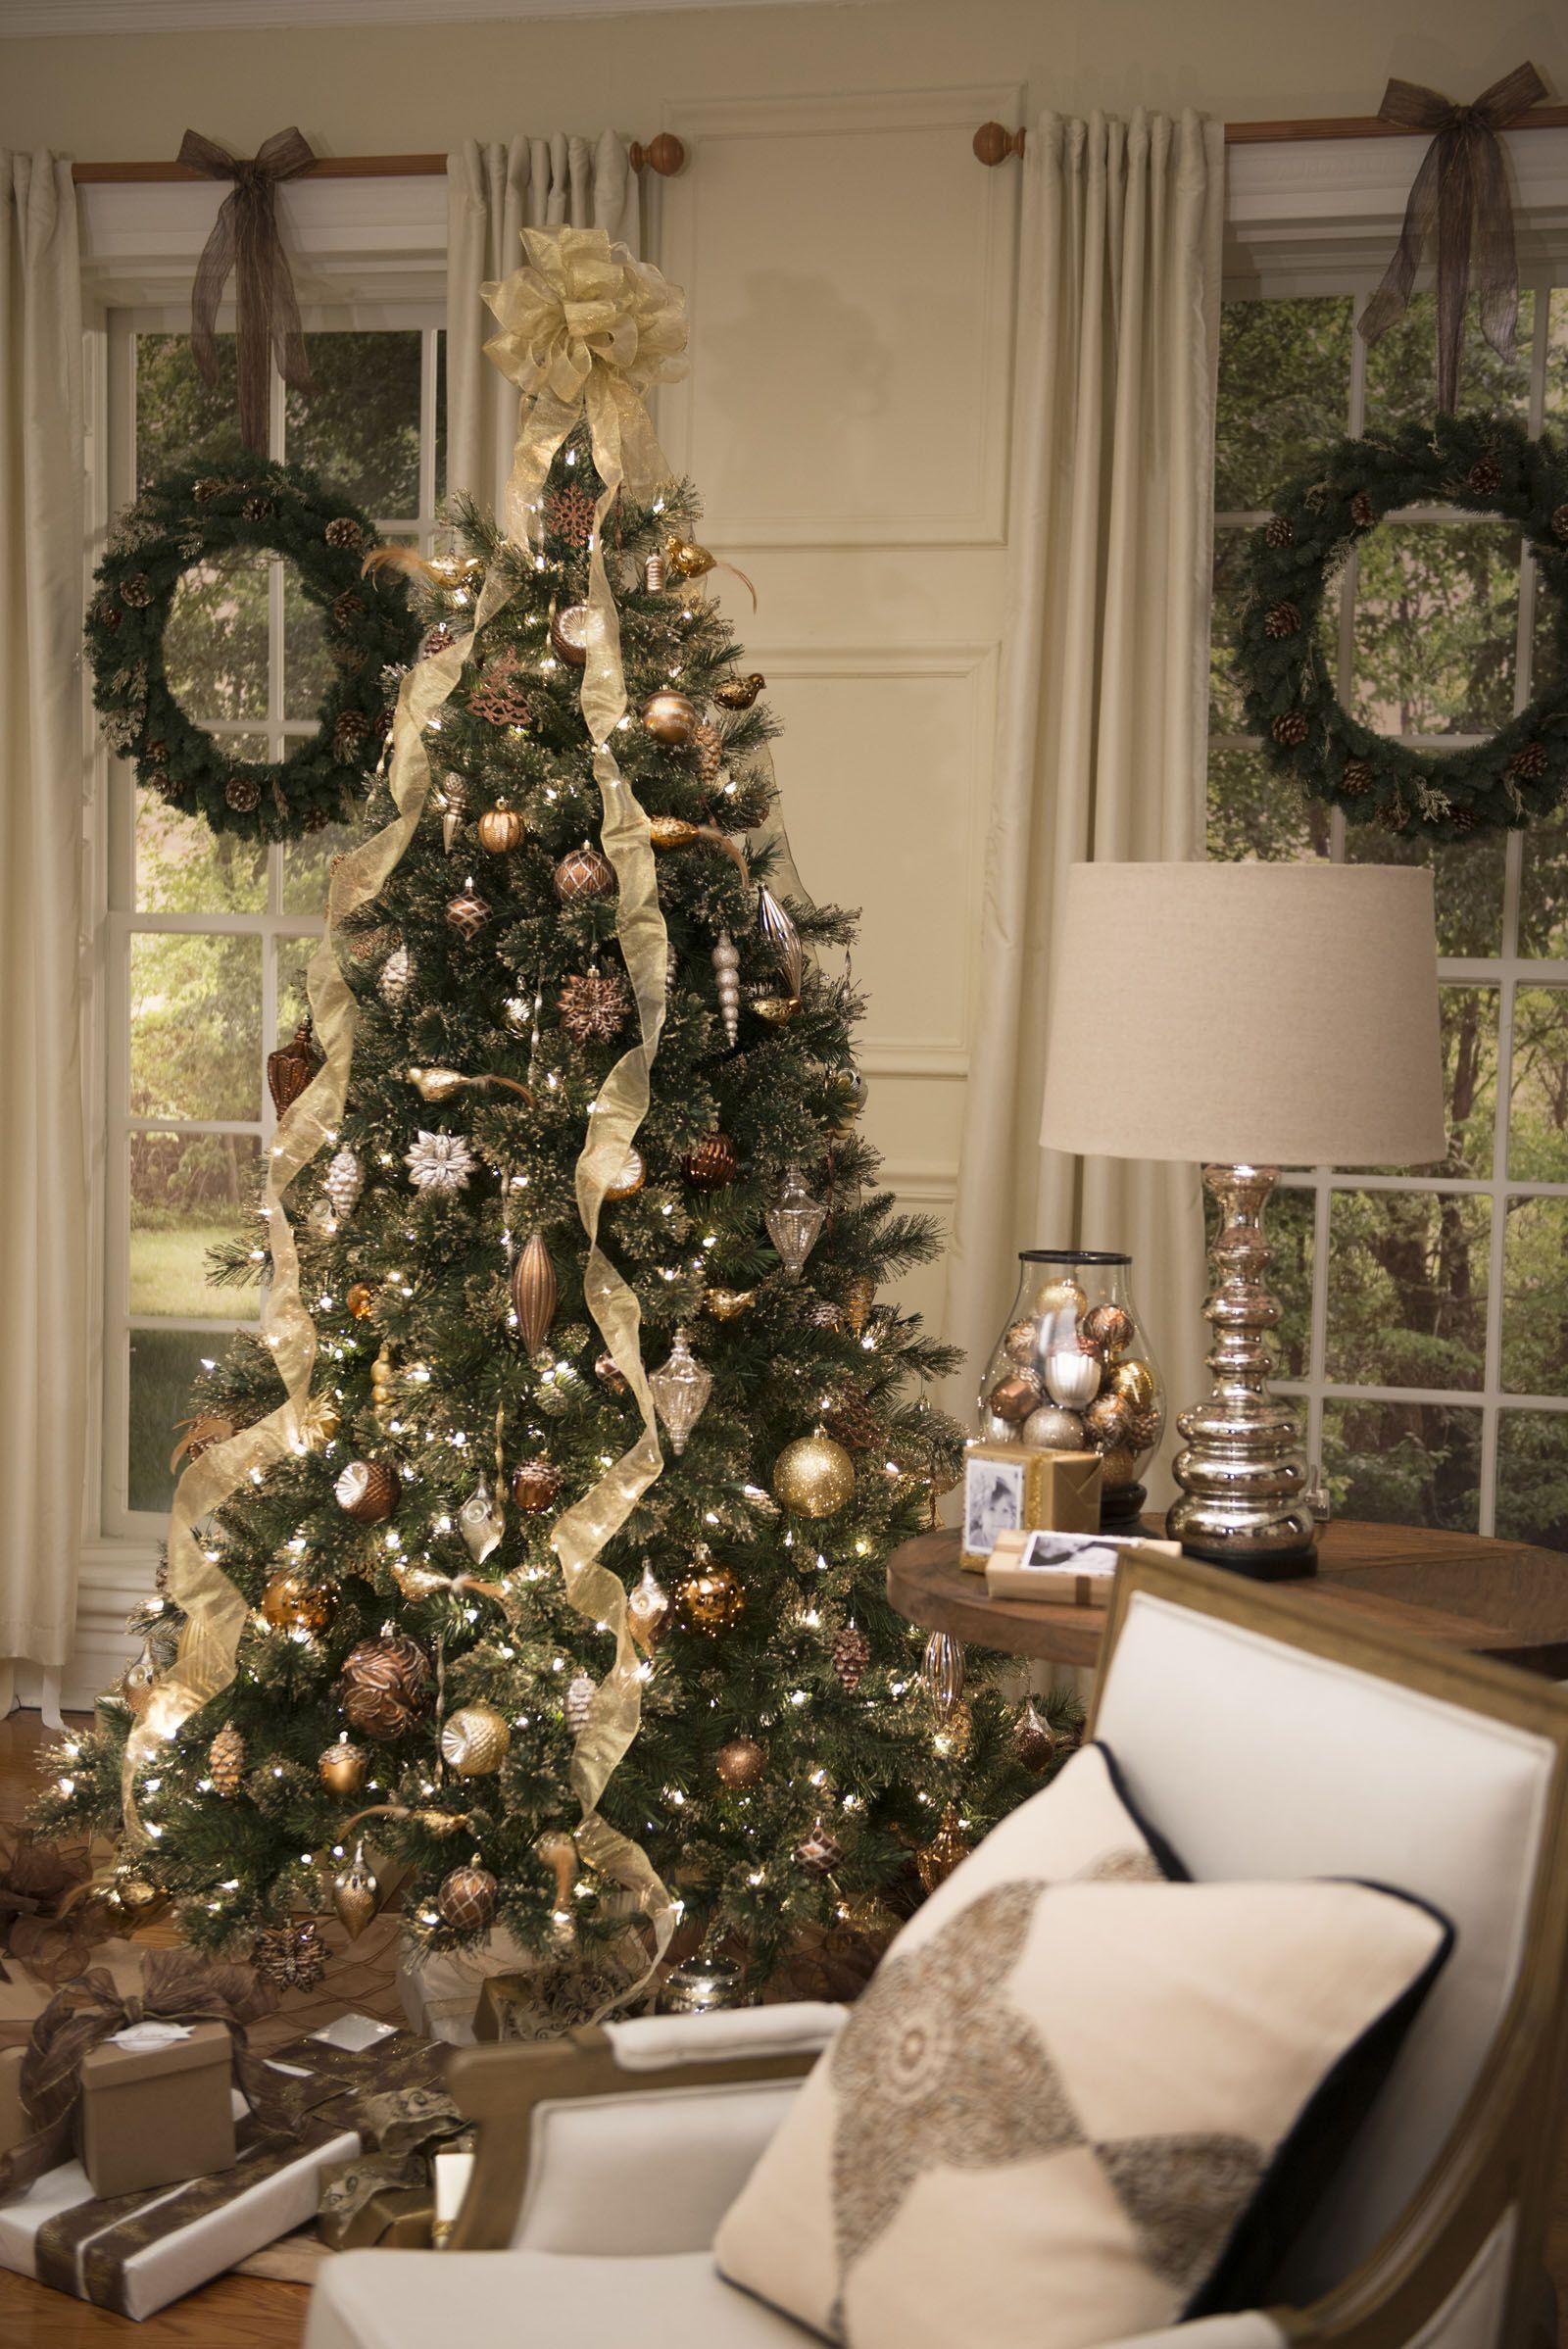 Martha Stewart Living Merry Metallic ornaments sparkle